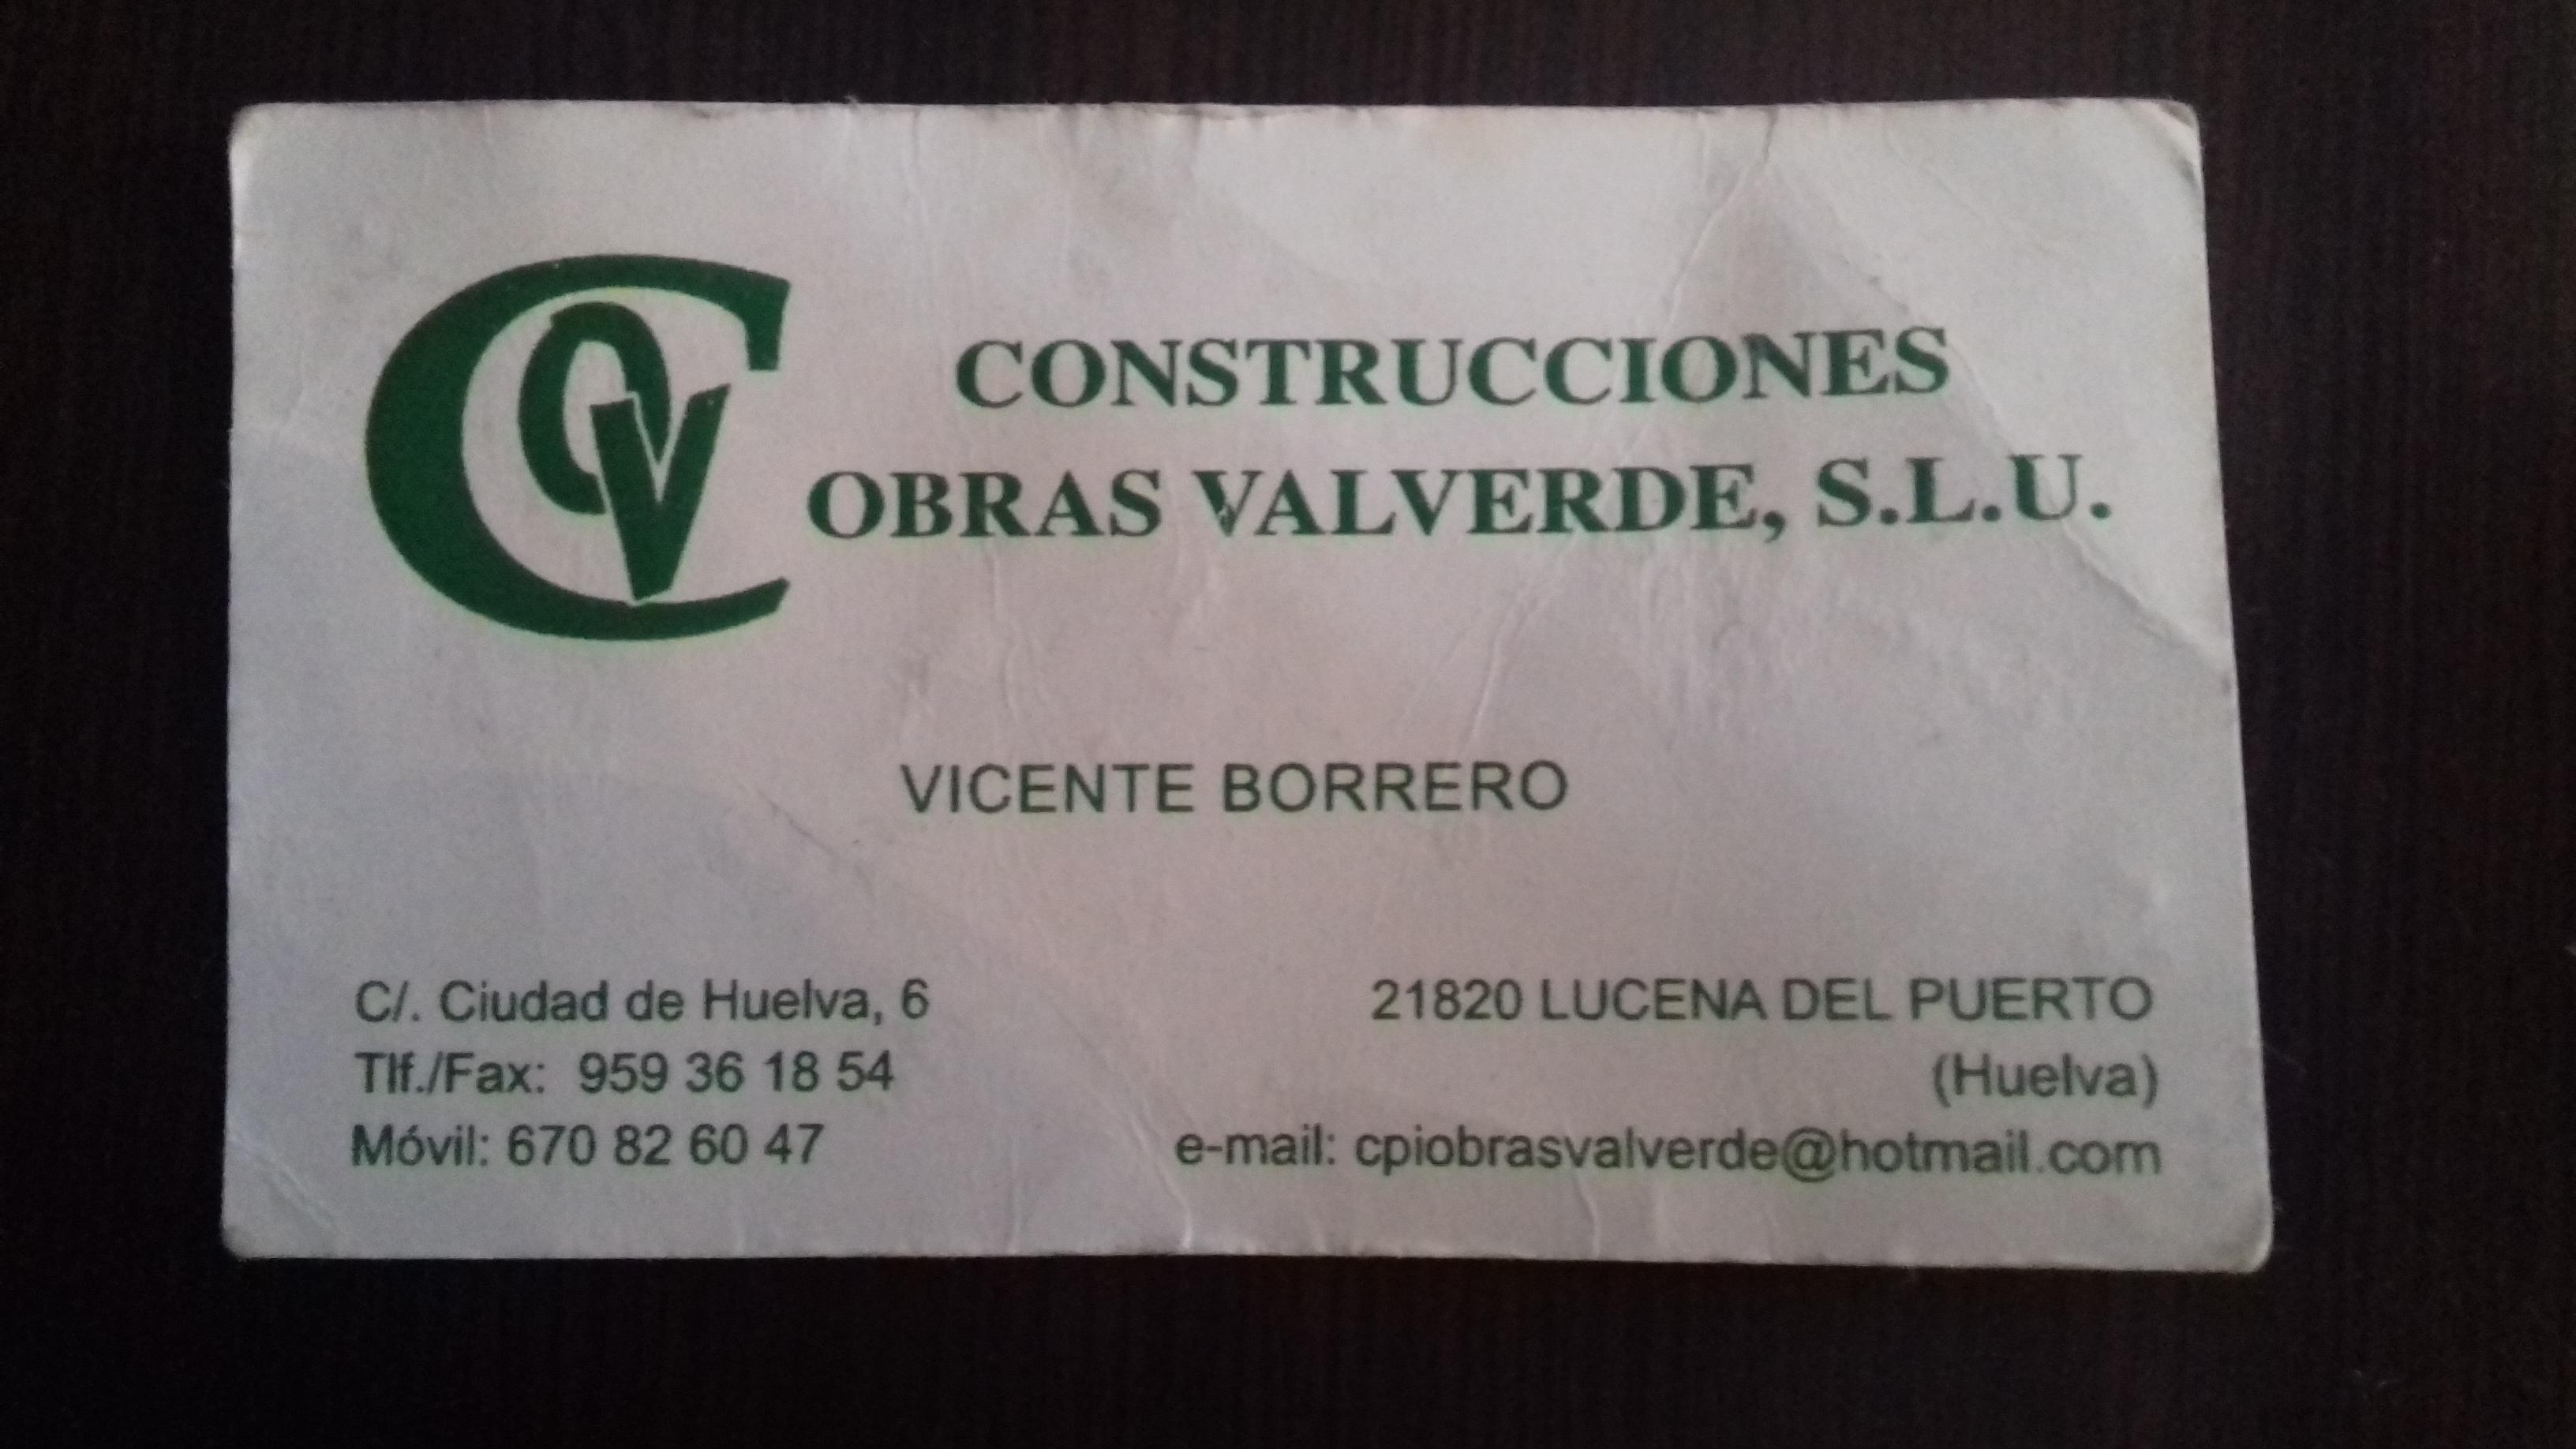 Obras Valverde S.l.u